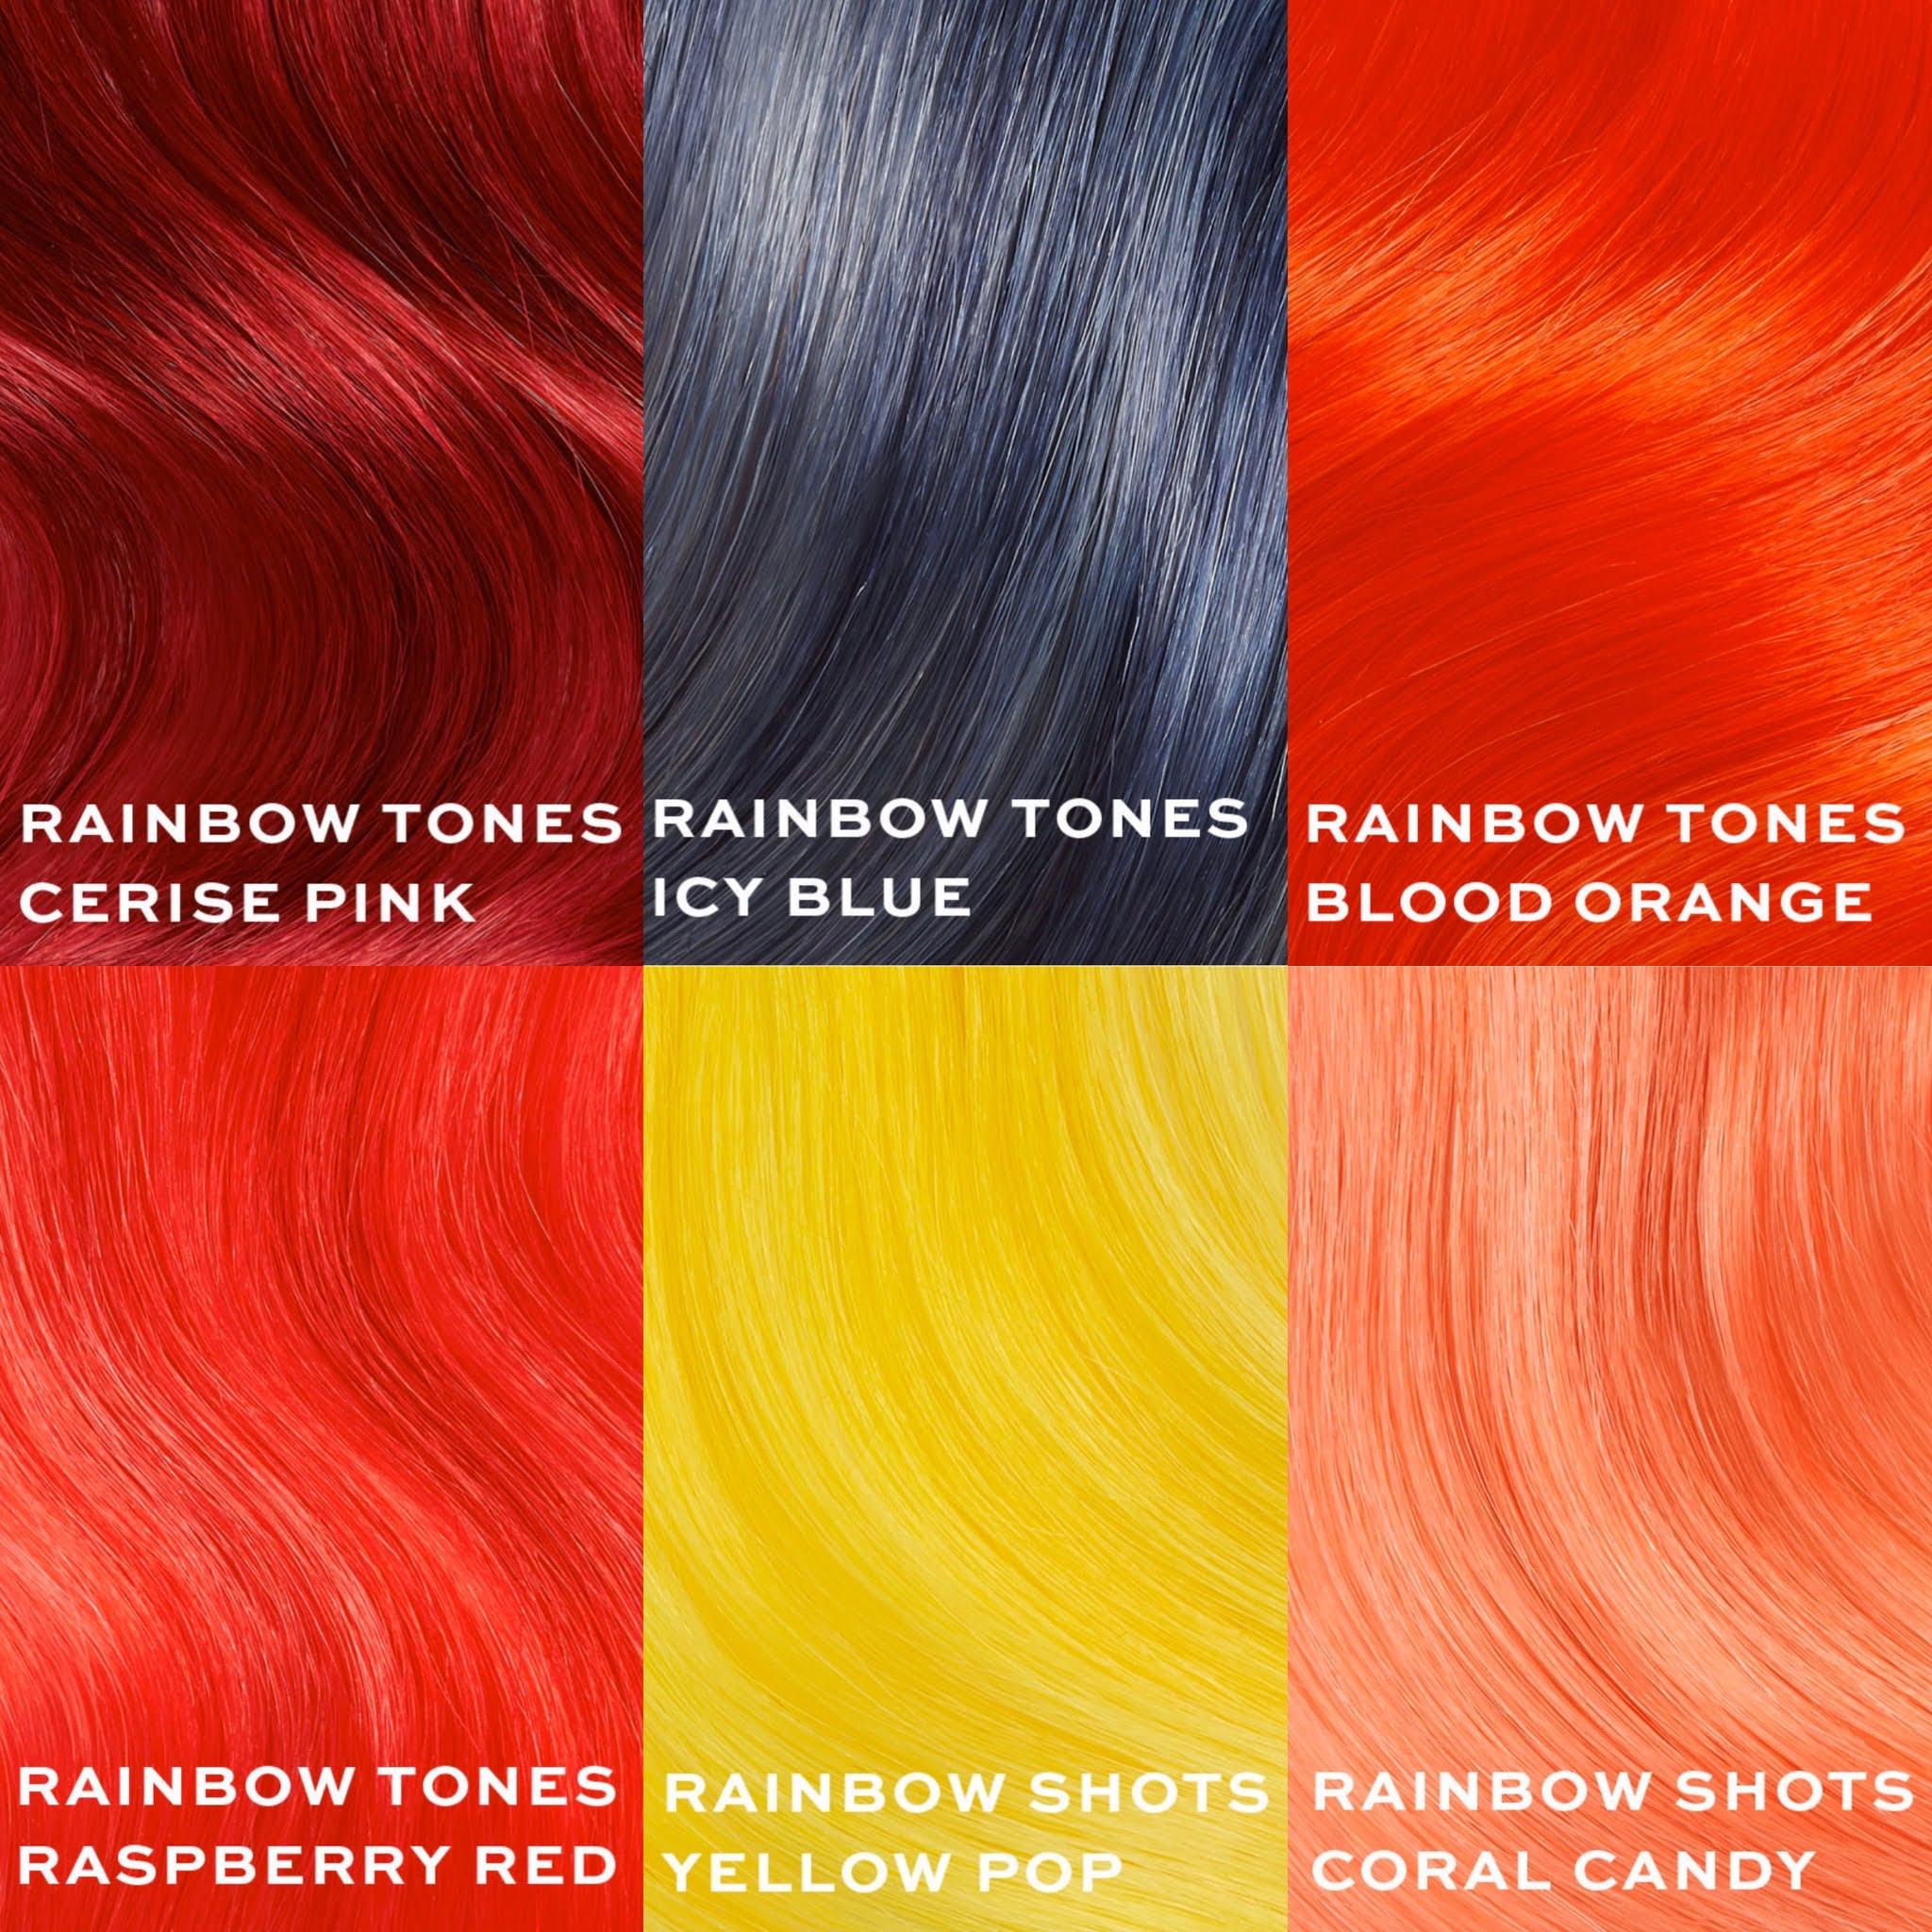 I Heart Revolution Rainbow Tones and Rainbow Shots Collection